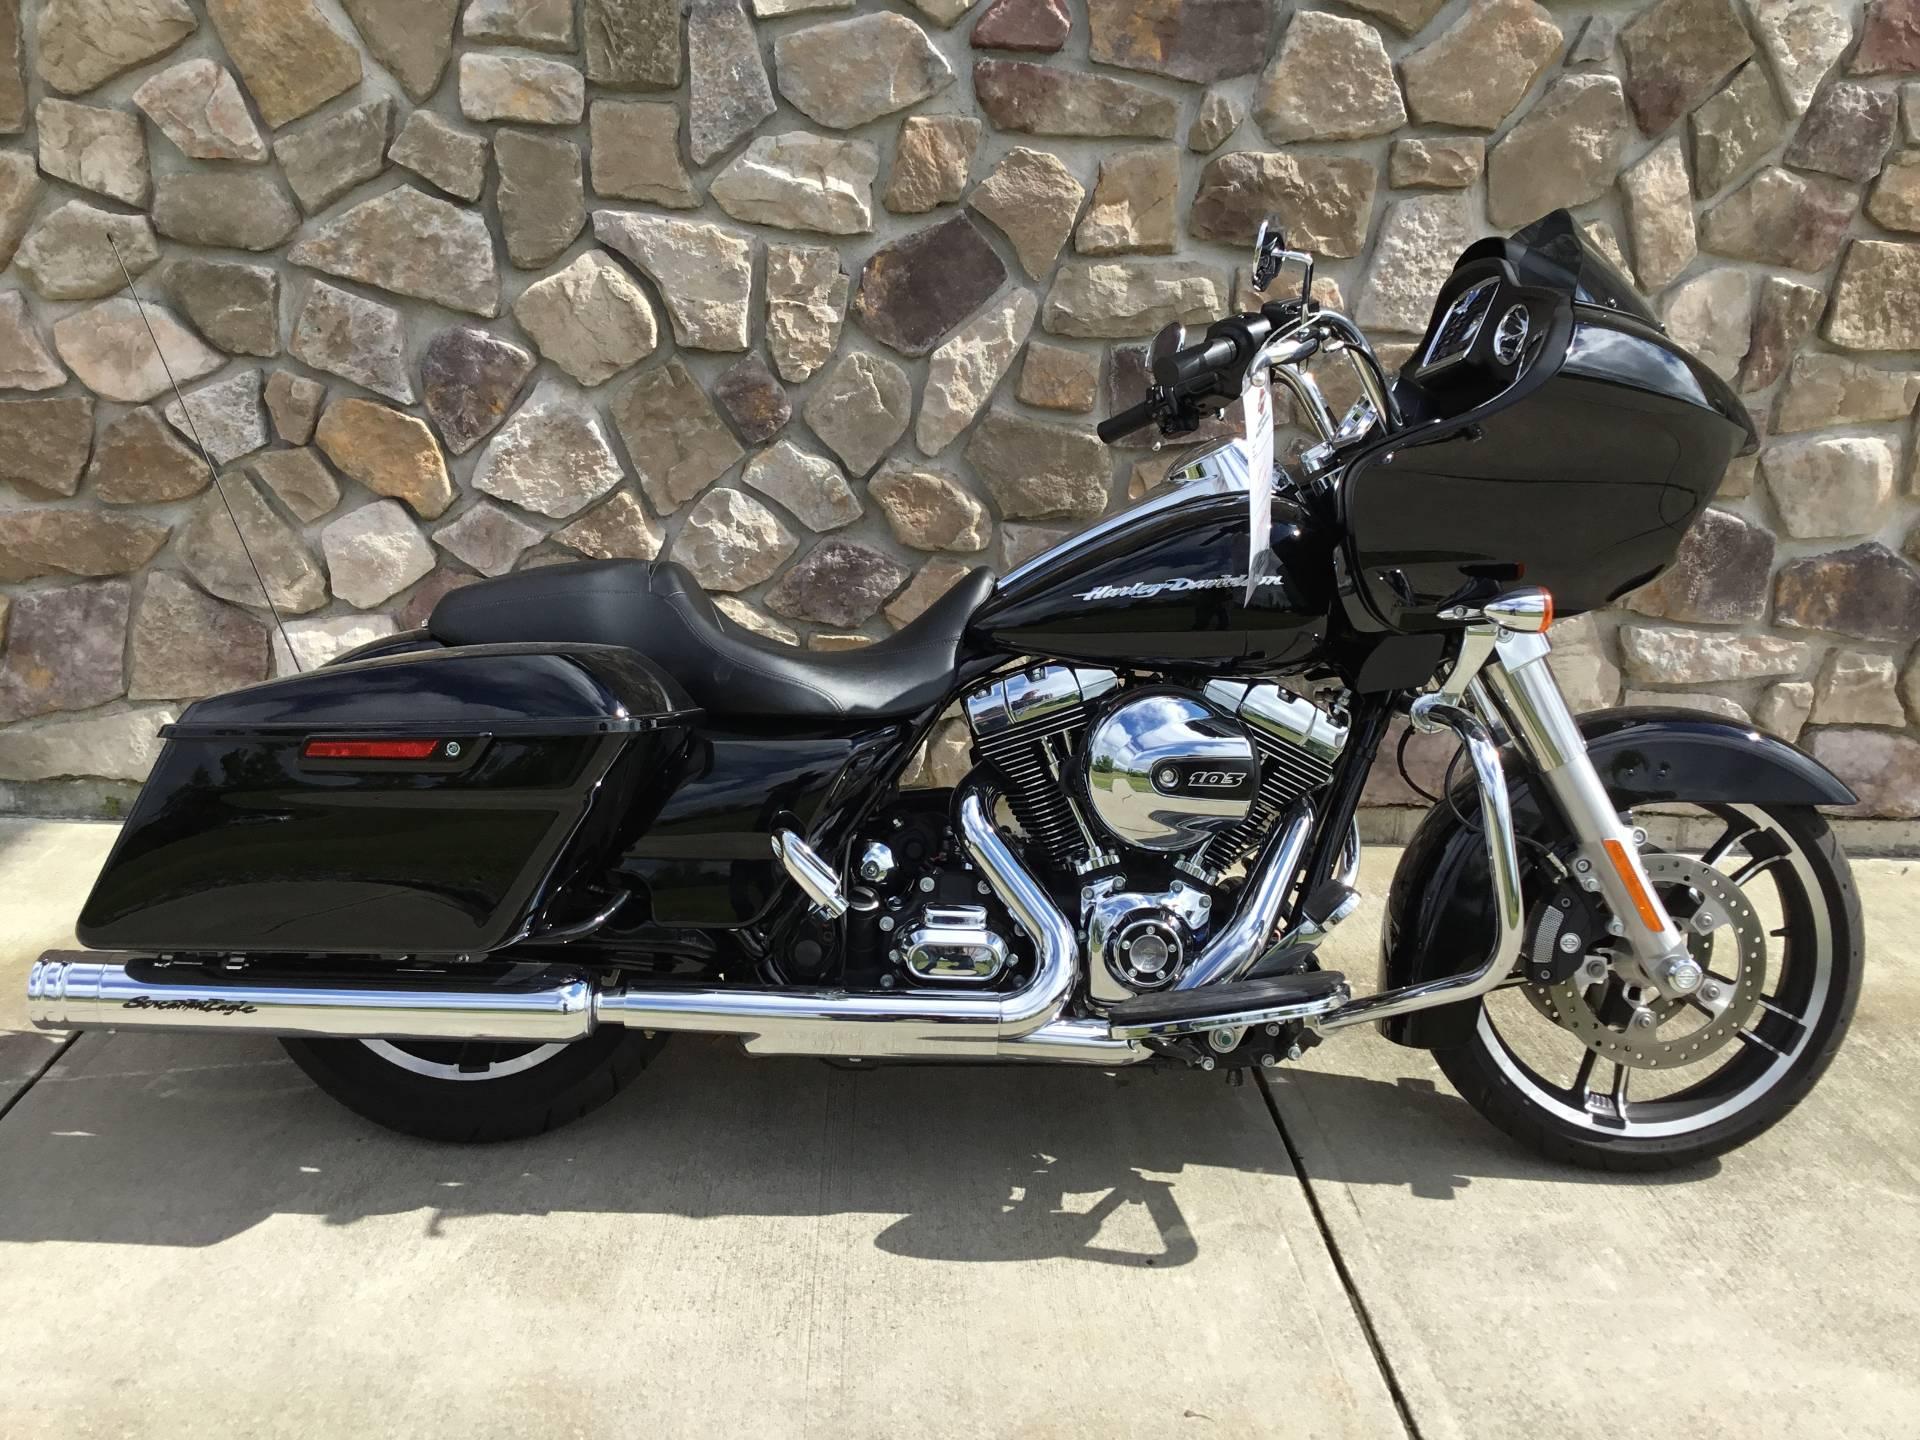 2015 Harley-Davidson Road Glide® Motorcycles Broadalbin New York ...